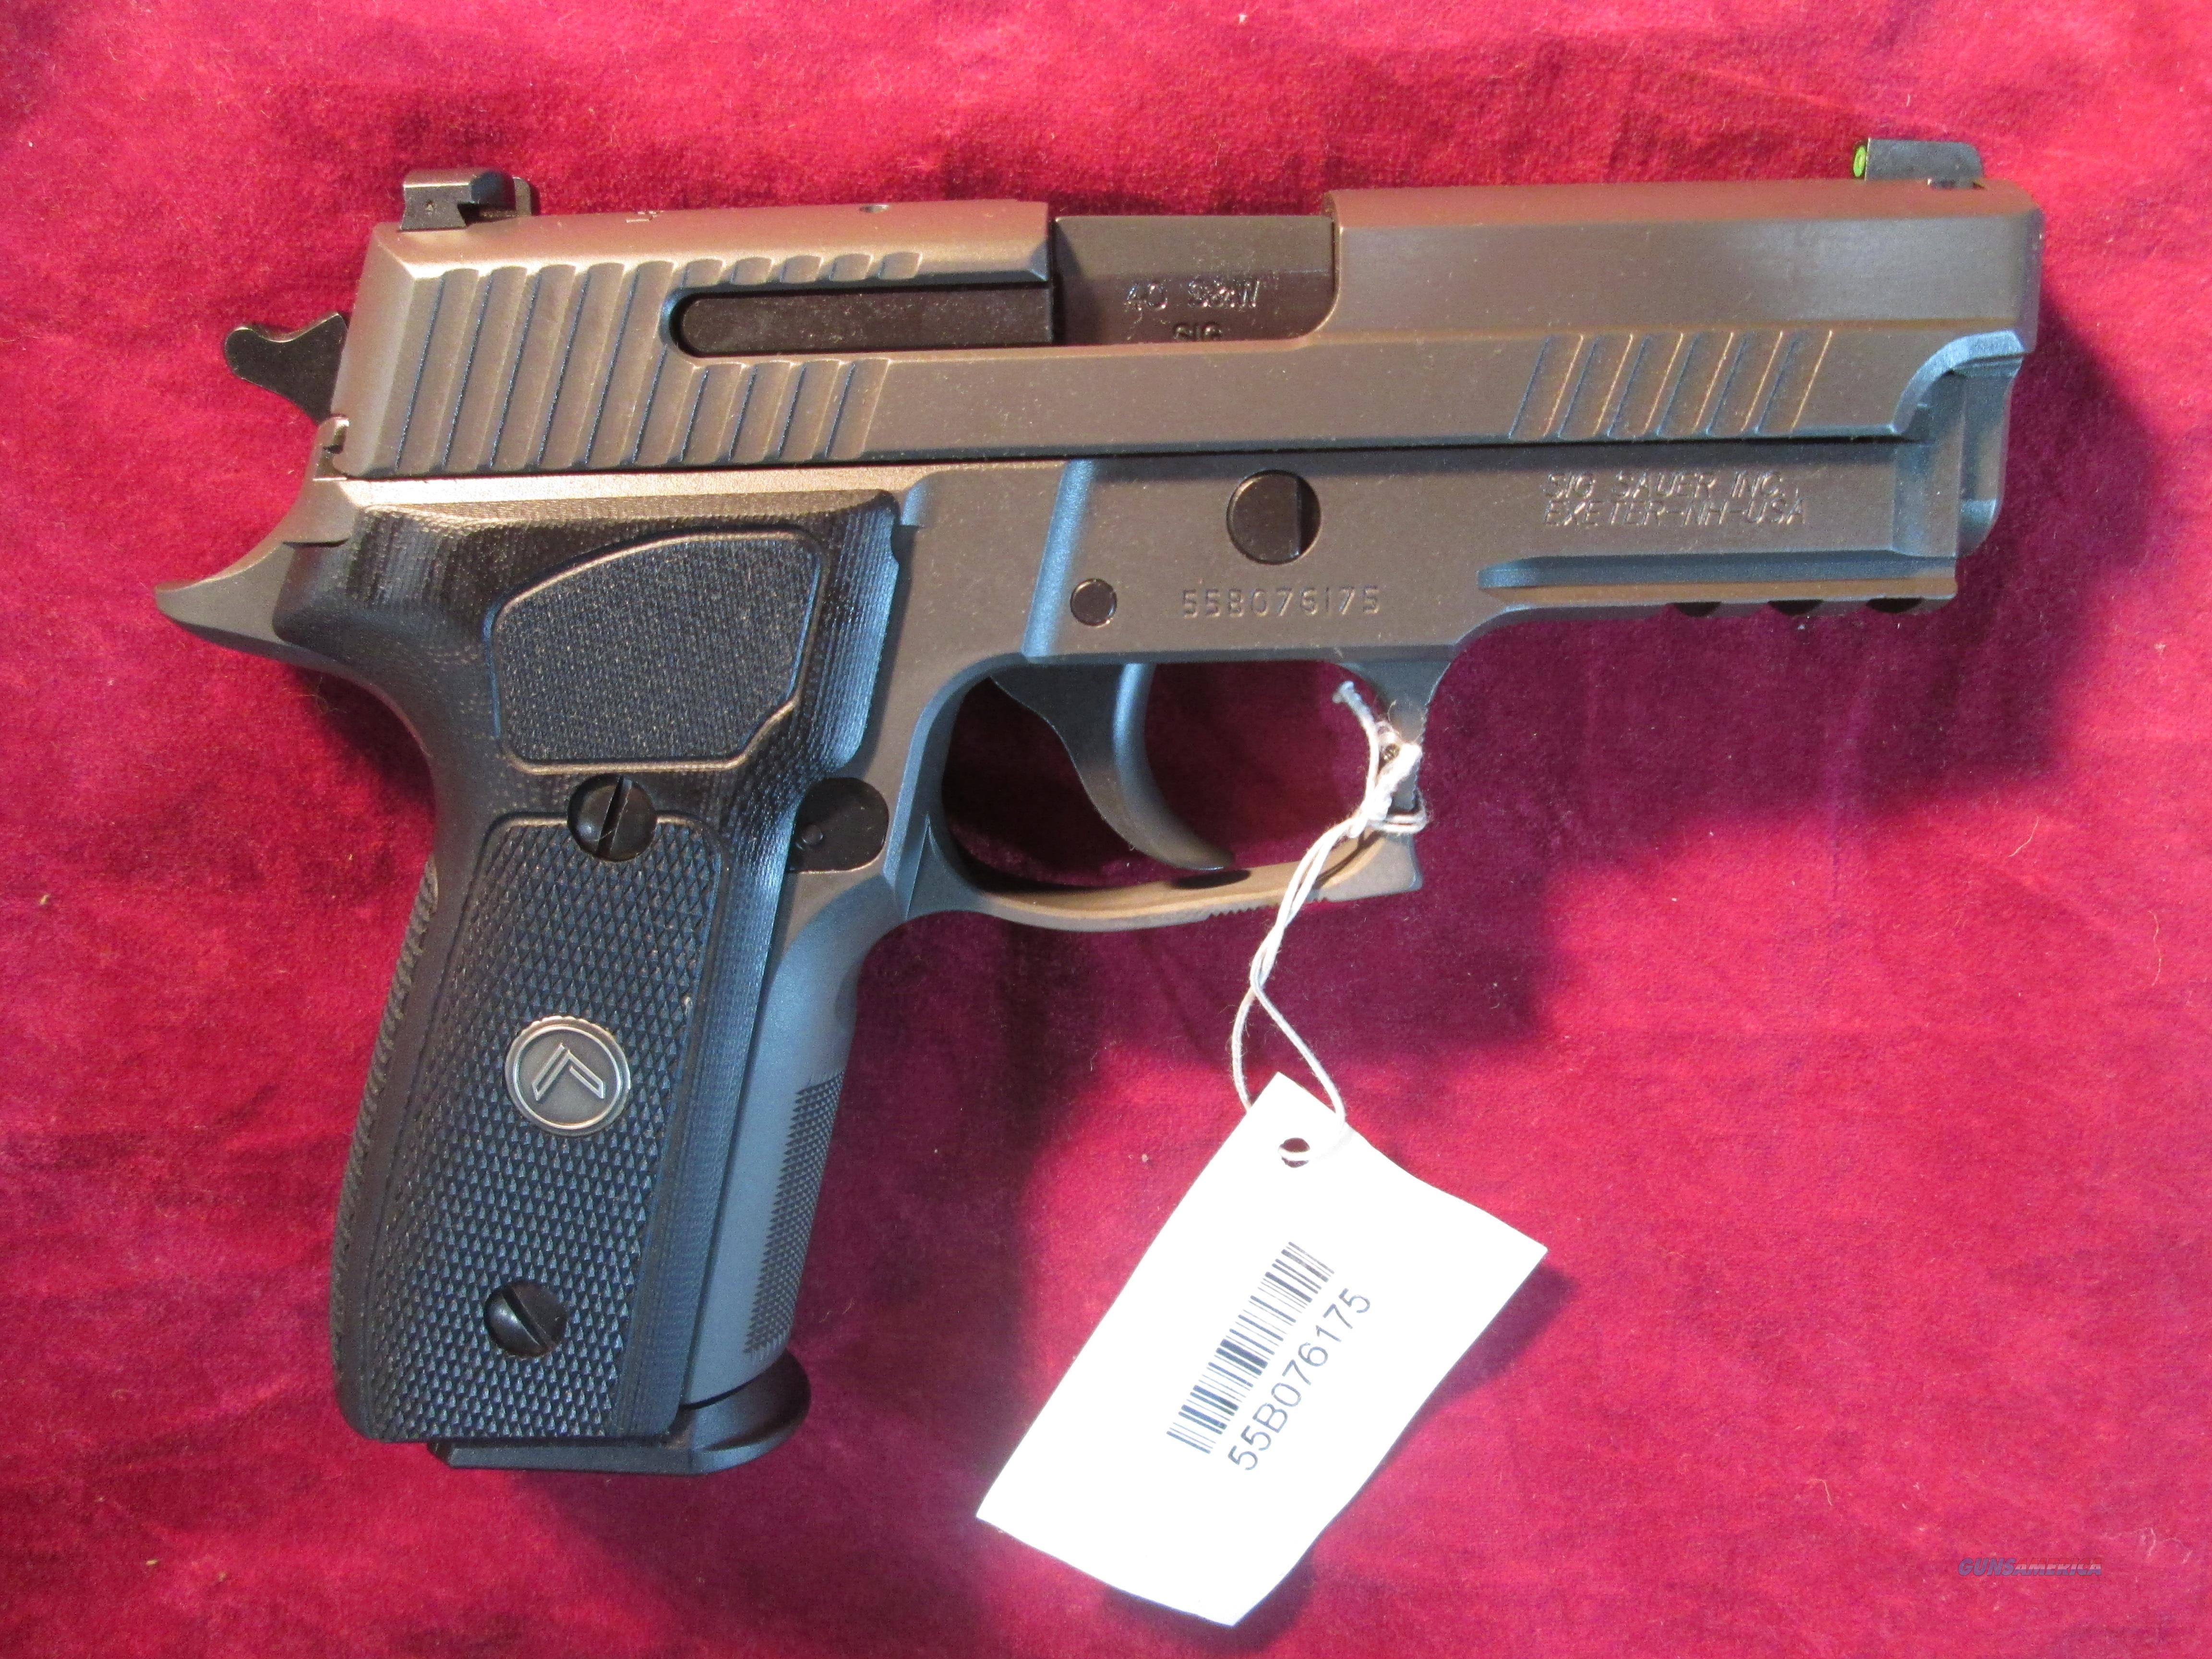 SIG SAUER P229 LEGION 40S&W NEW (E29R-40-LEGION)  Guns > Pistols > Sig - Sauer/Sigarms Pistols > P226